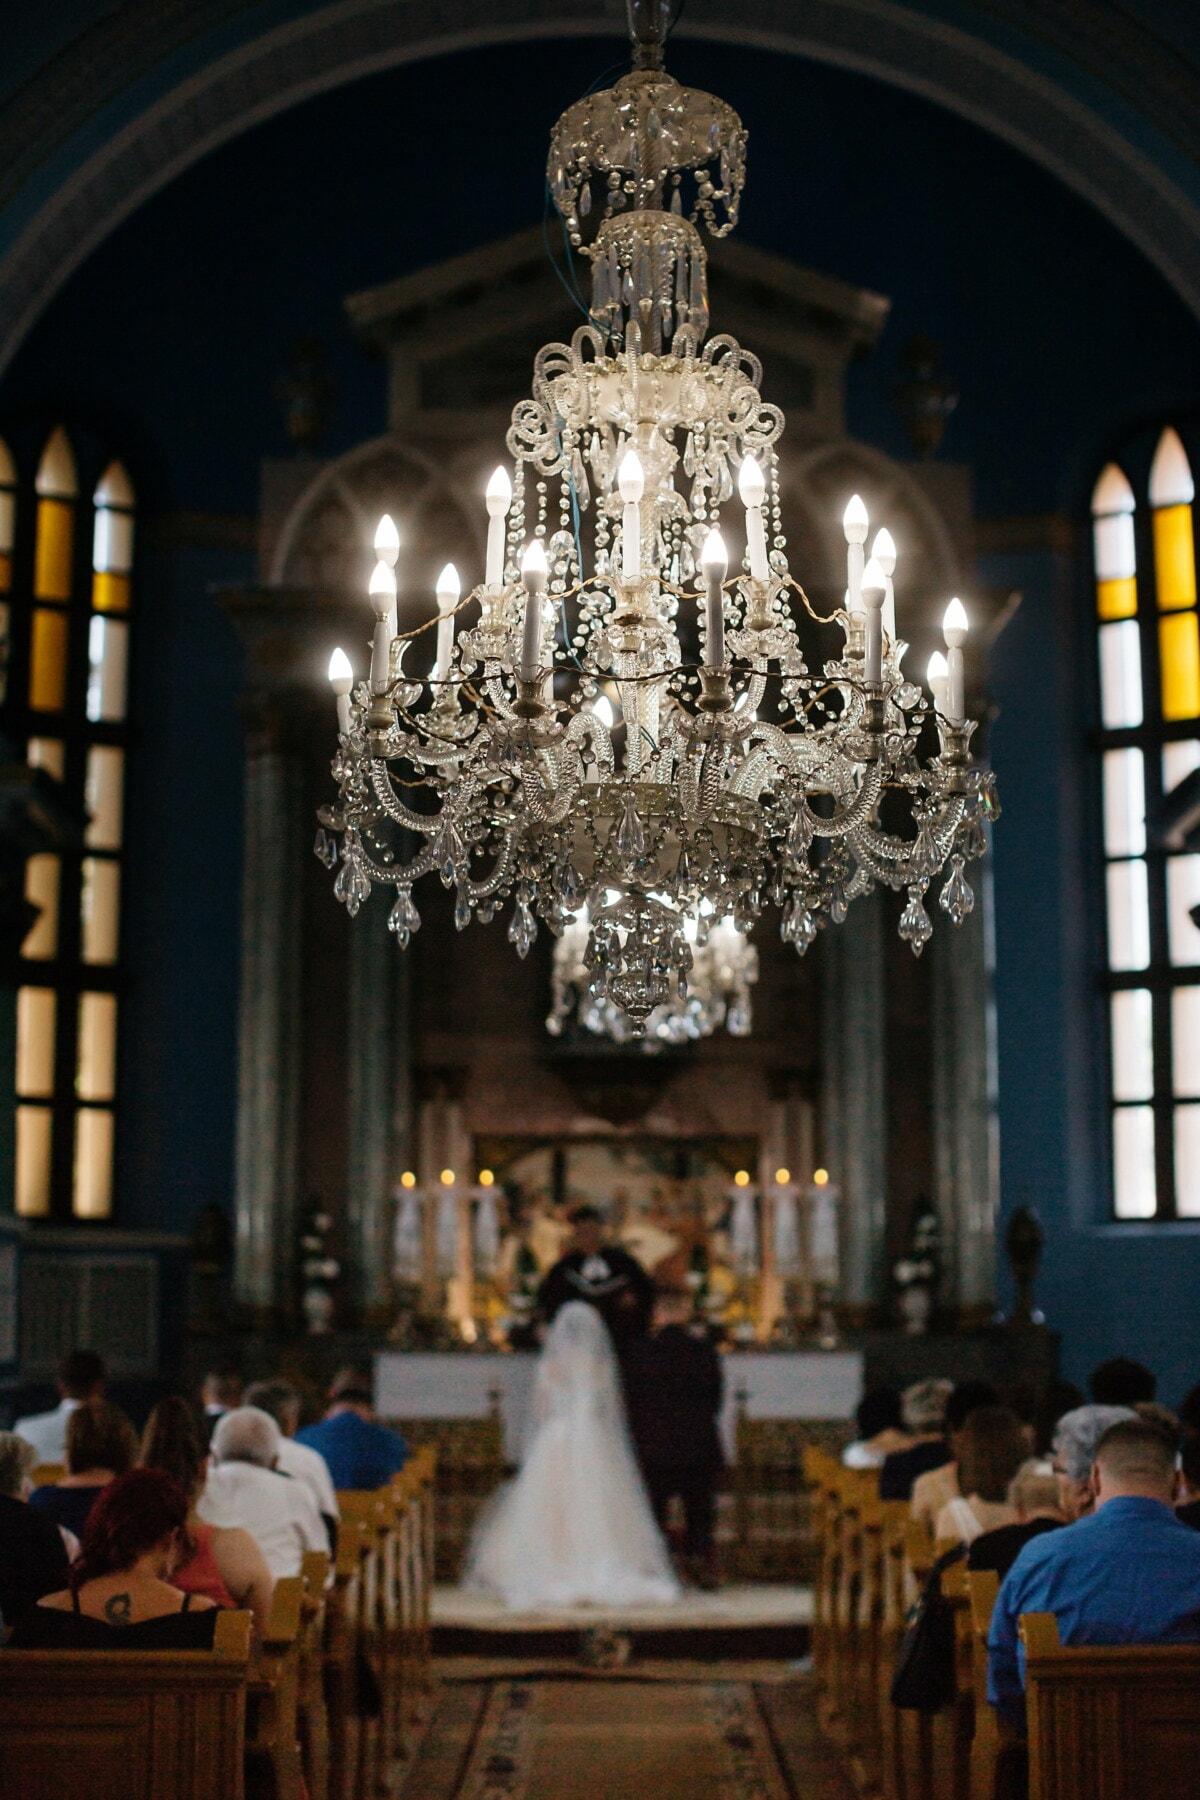 chandelier, crystal, baroque, church, interior decoration, wedding, building, cathedral, altar, architecture